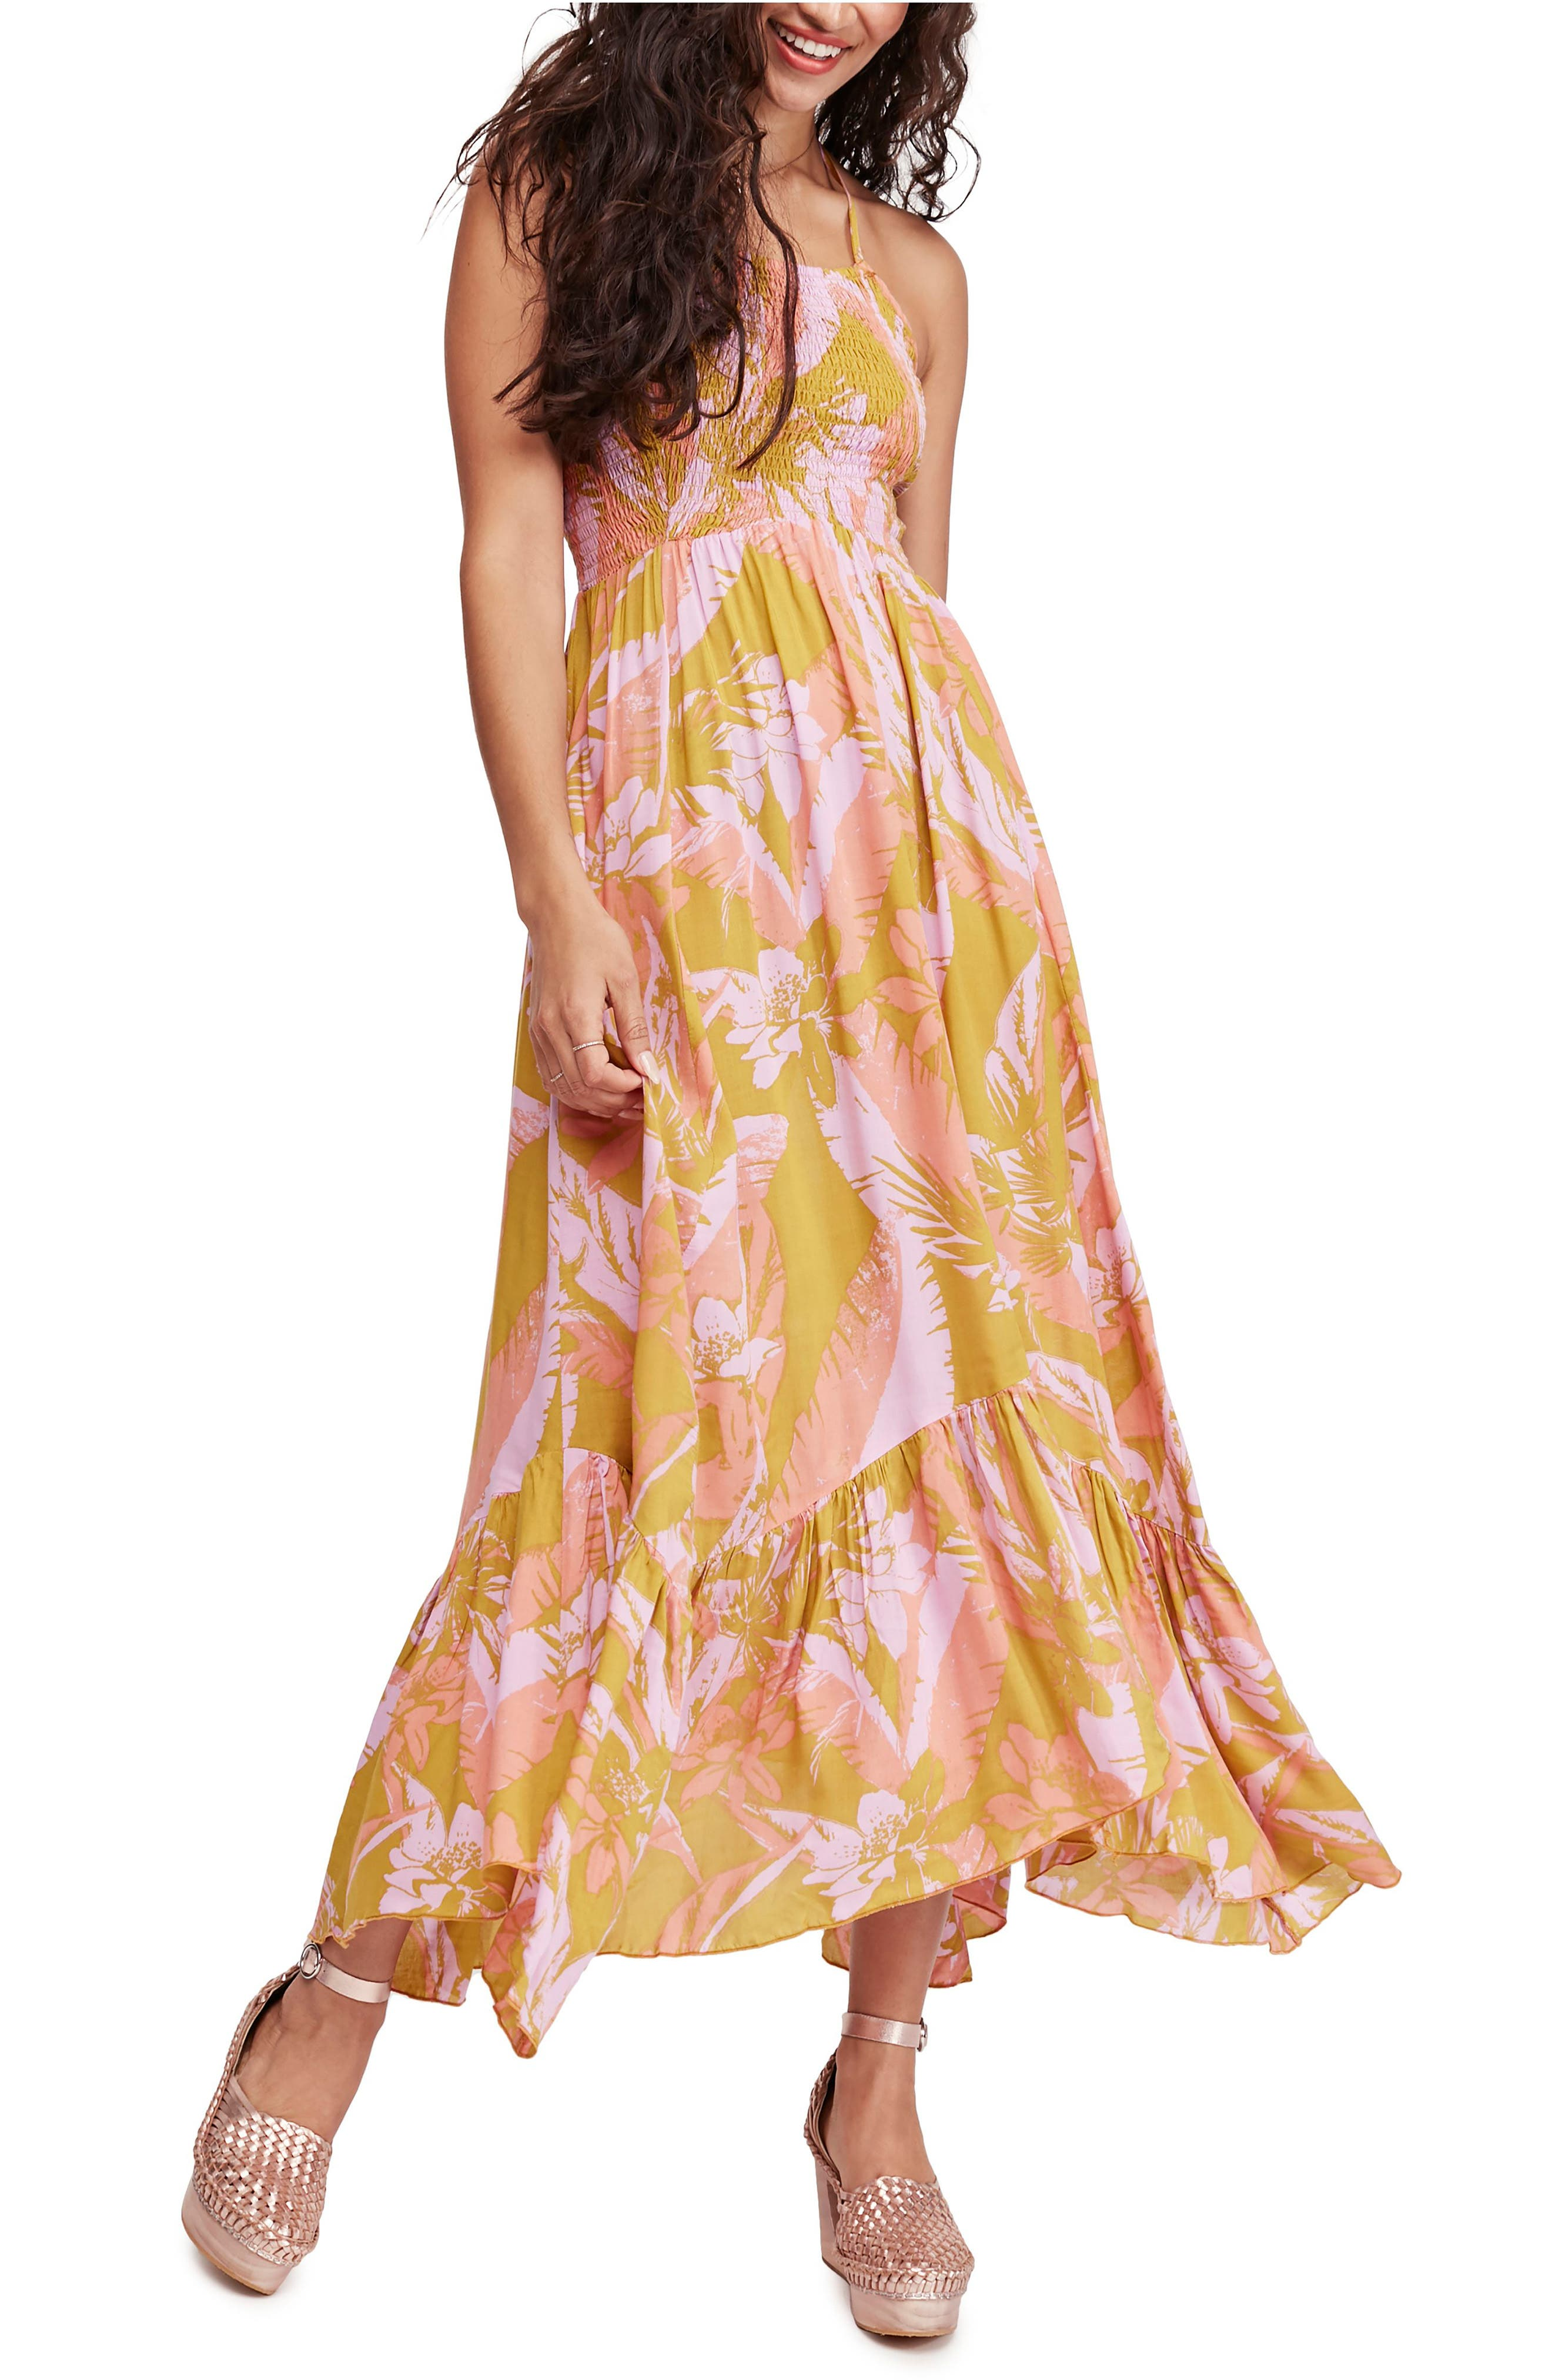 Free People Heat Wave Floral Print High/low Dress, Metallic